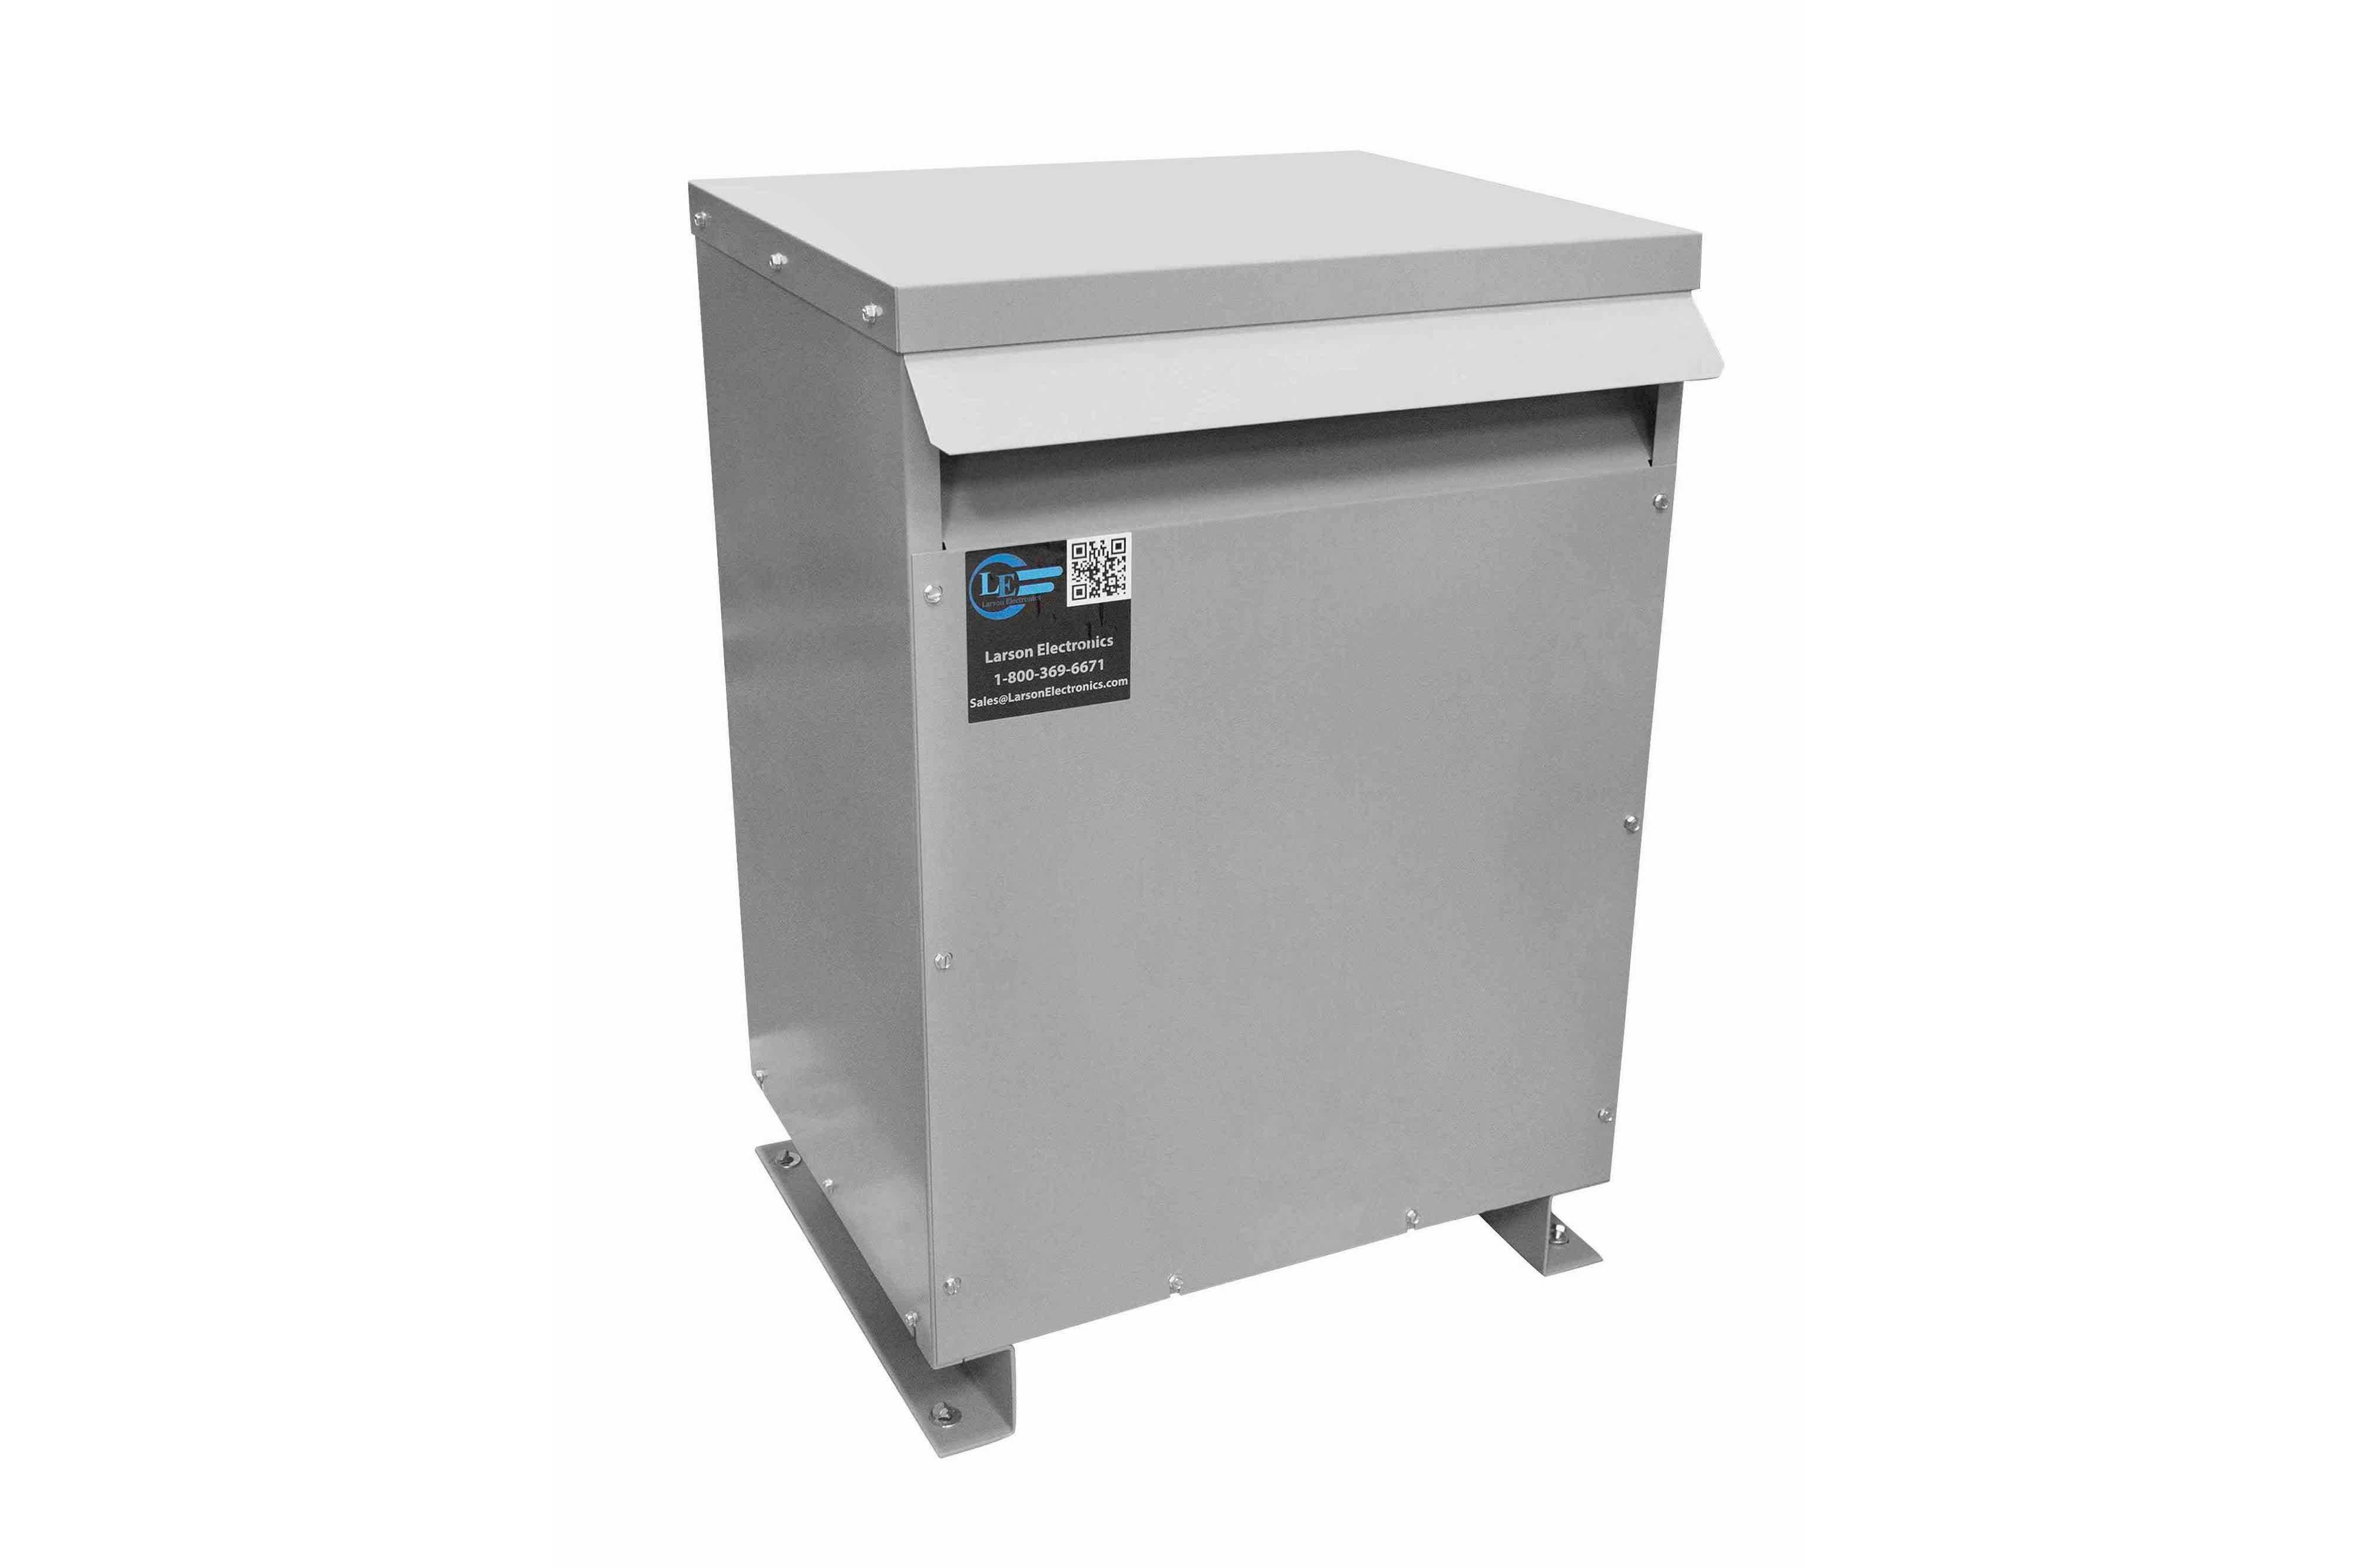 35 kVA 3PH Isolation Transformer, 440V Wye Primary, 208V Delta Secondary, N3R, Ventilated, 60 Hz